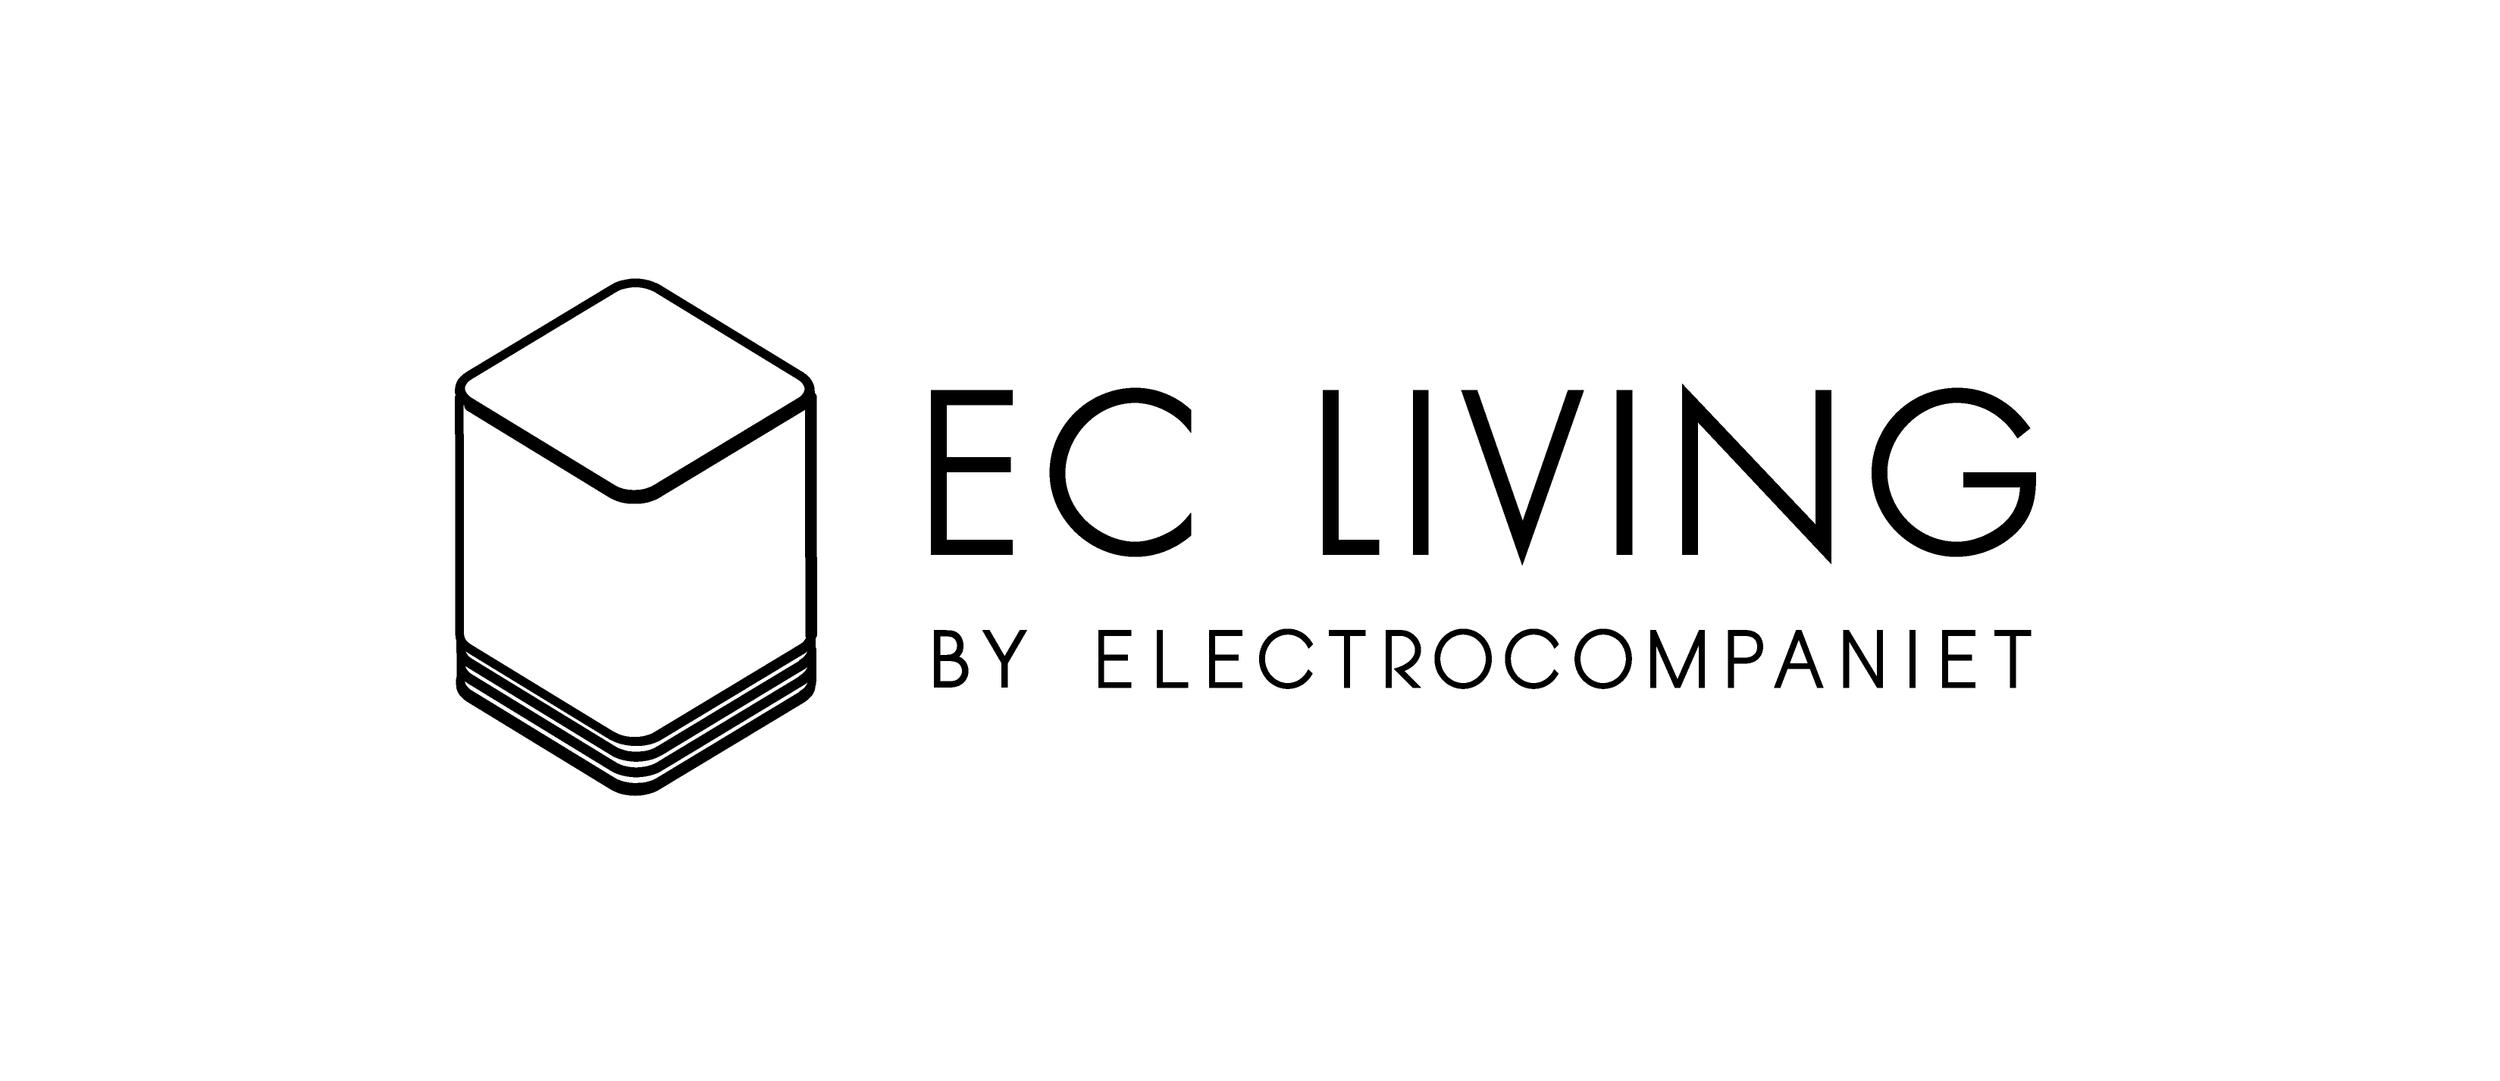 EC LIVING DONG THANH HOA PHUC